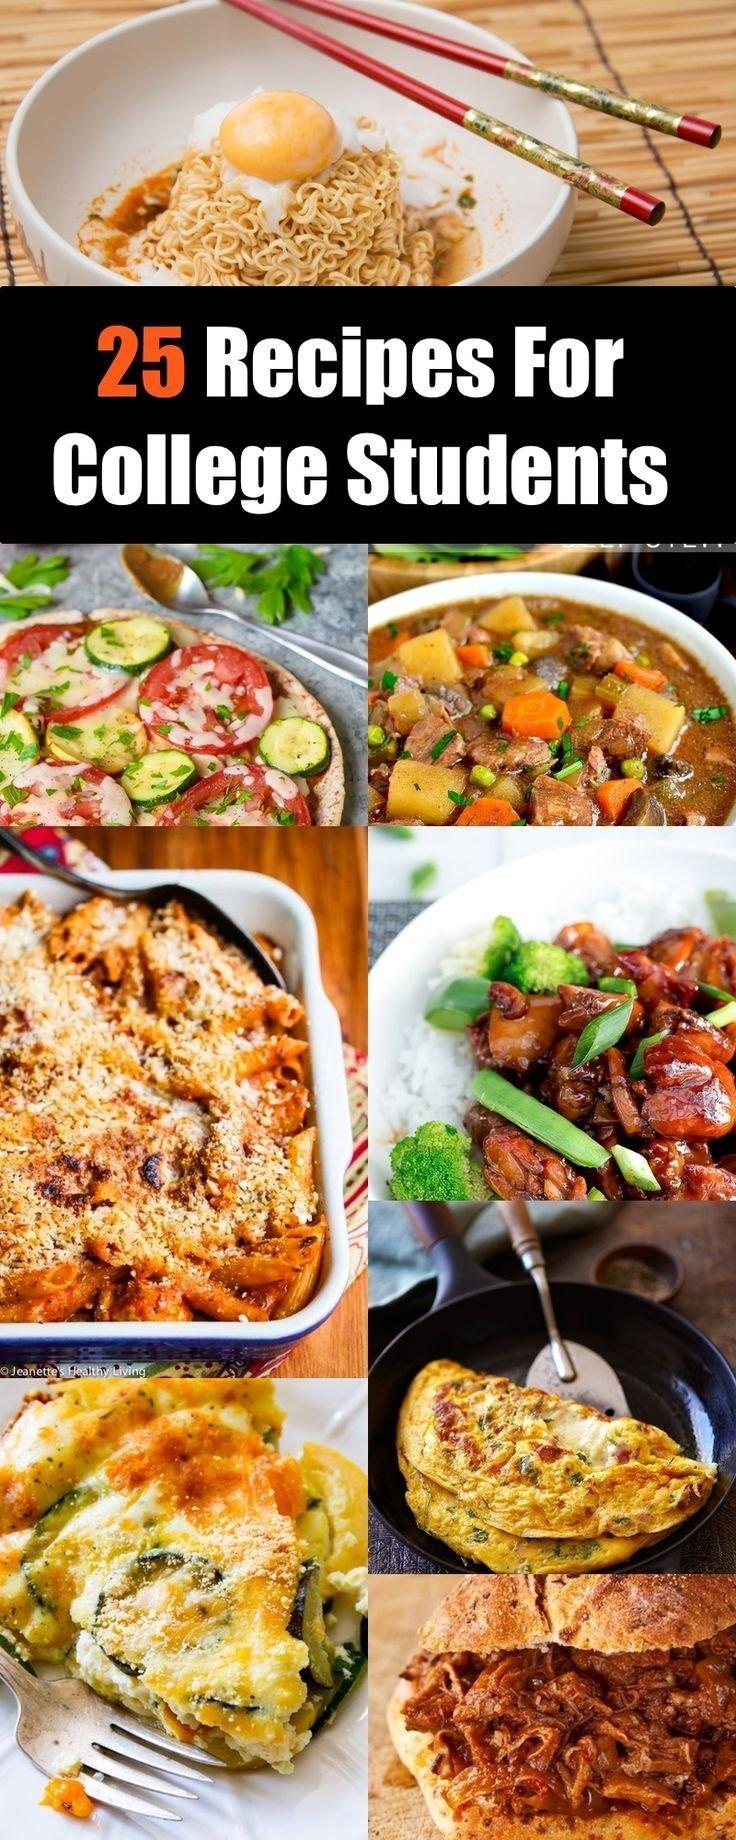 10 Trendy Cheap Dinner Ideas For 4 2715 best college recipes images on pinterest kitchens rezepte 2 2020